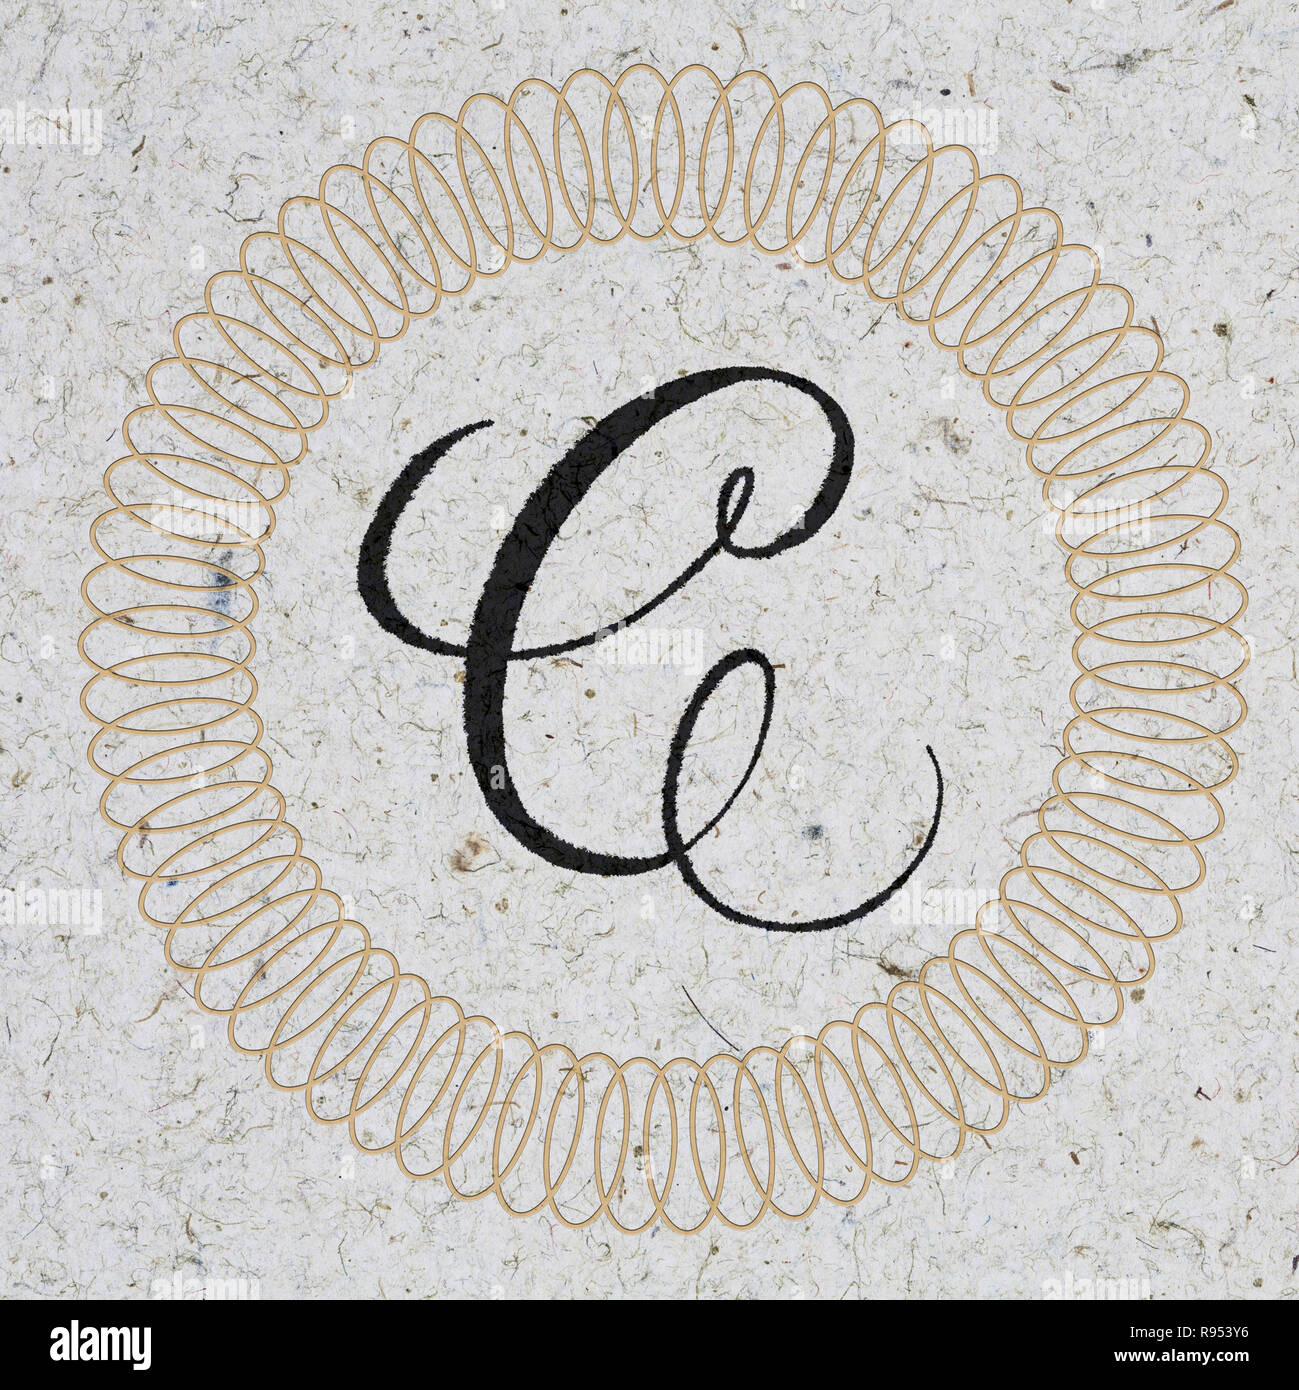 99caf02d1f Letra C hand lettering monograma - tinta sobre papel kraft con ornamento  Imagen De Stock